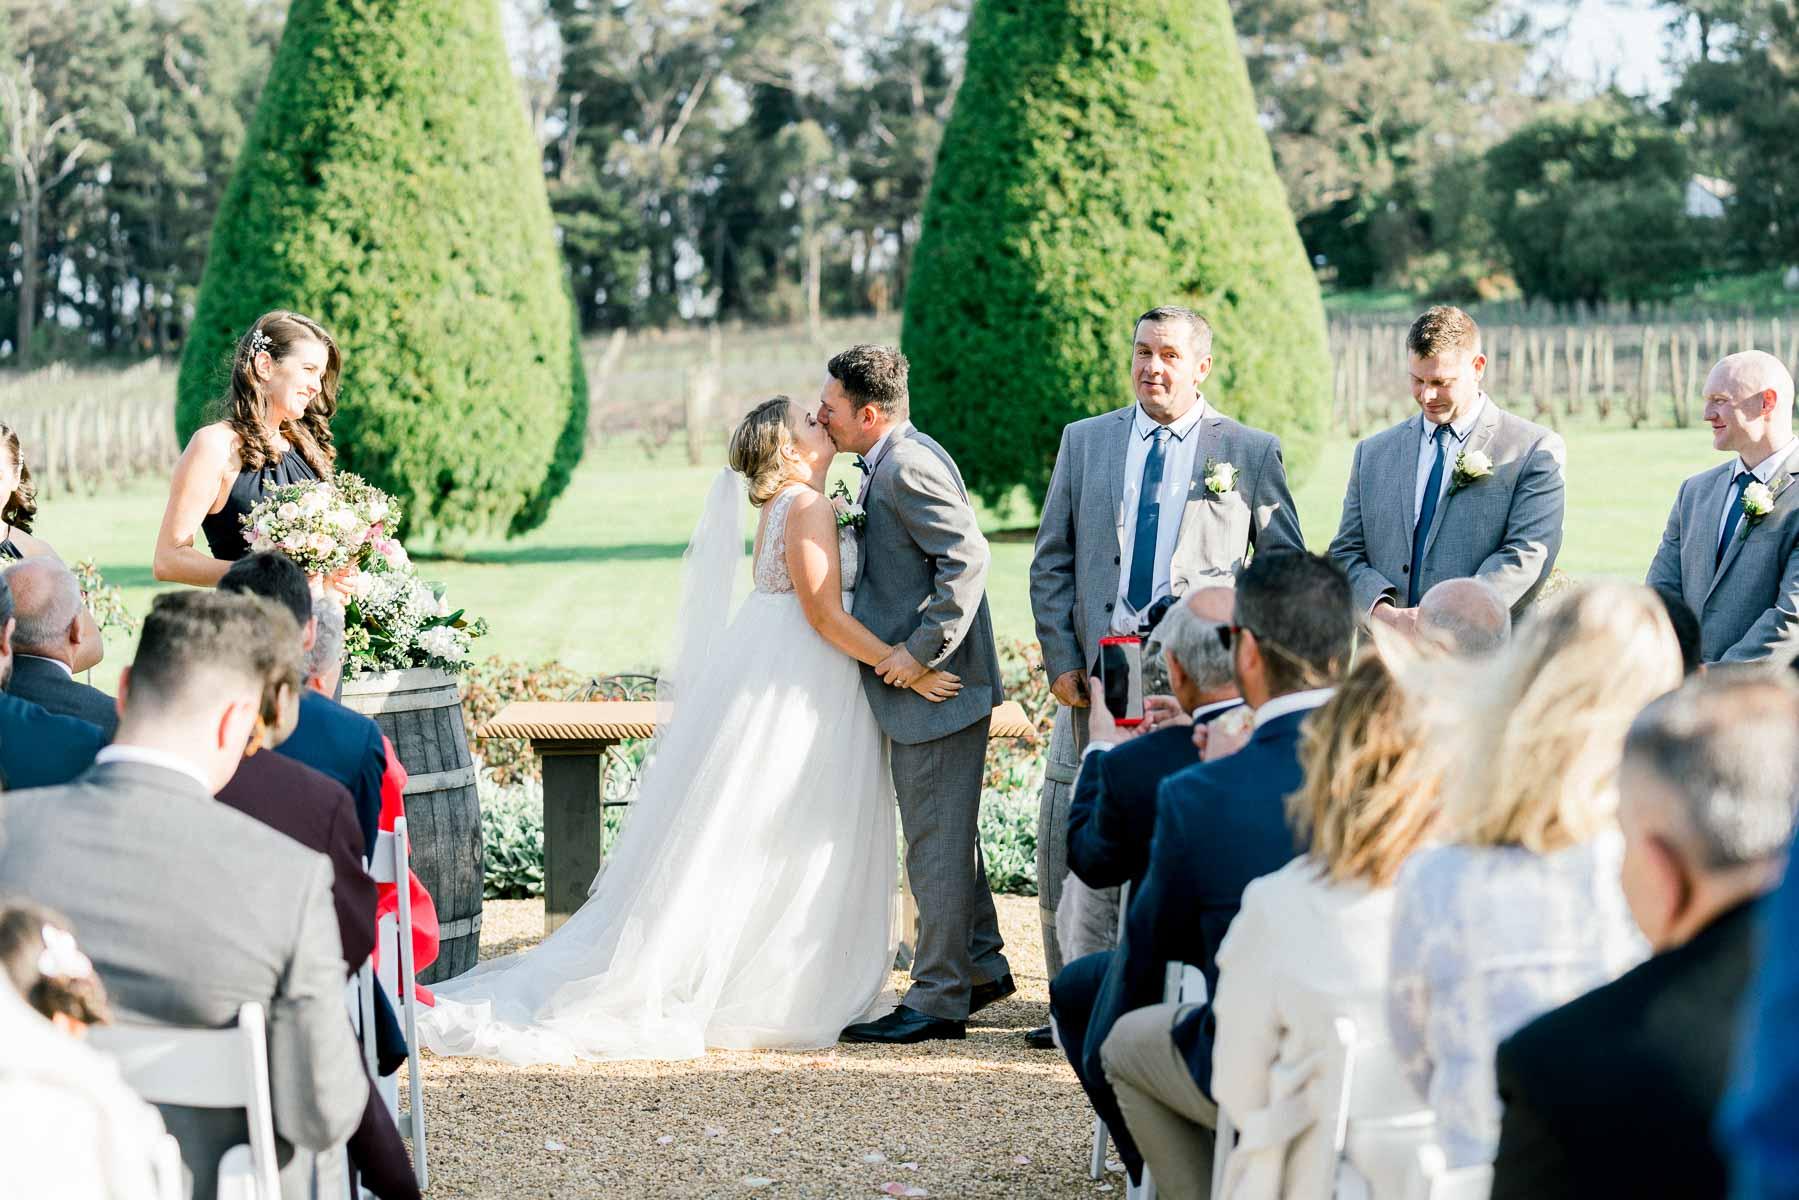 lindenderry-wedding-heart+soul-weddings-amy-alain-03379.jpg